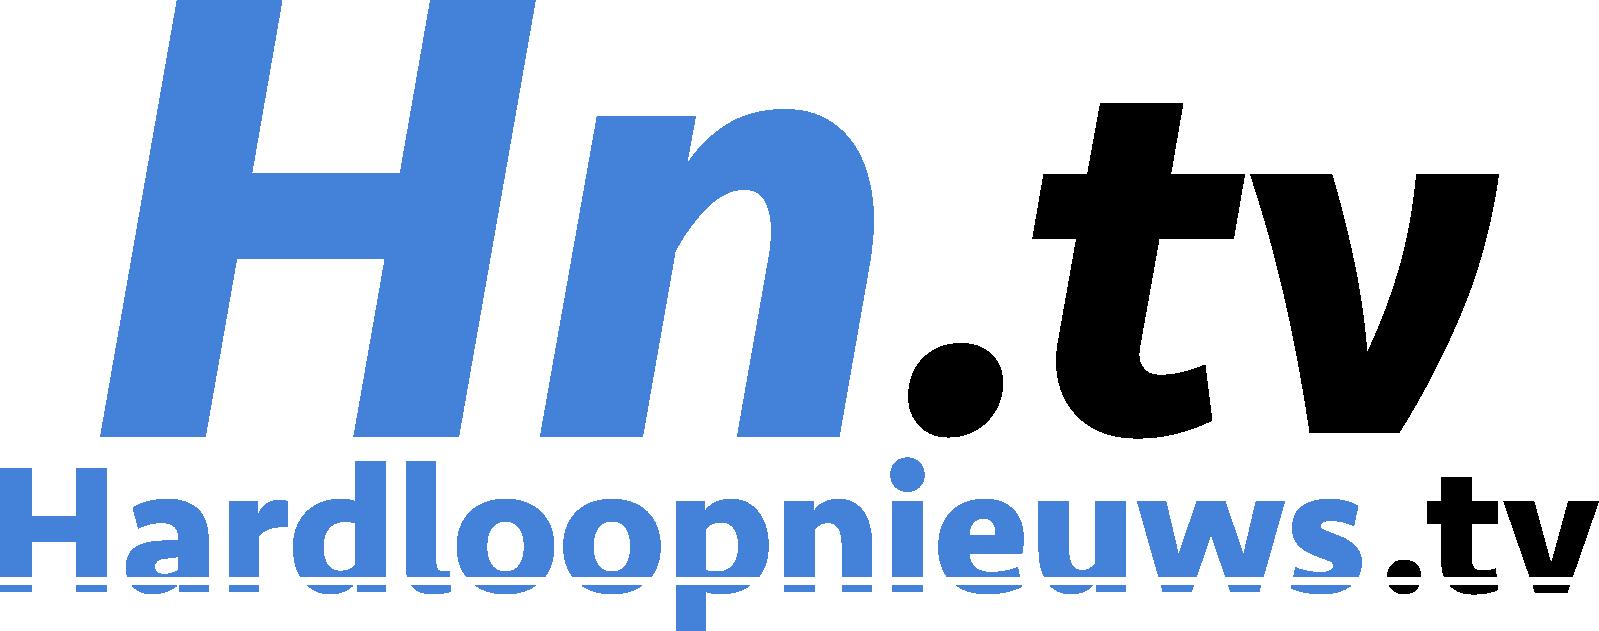 Hardloopfotos.nl en Hardloopnieuws.tv